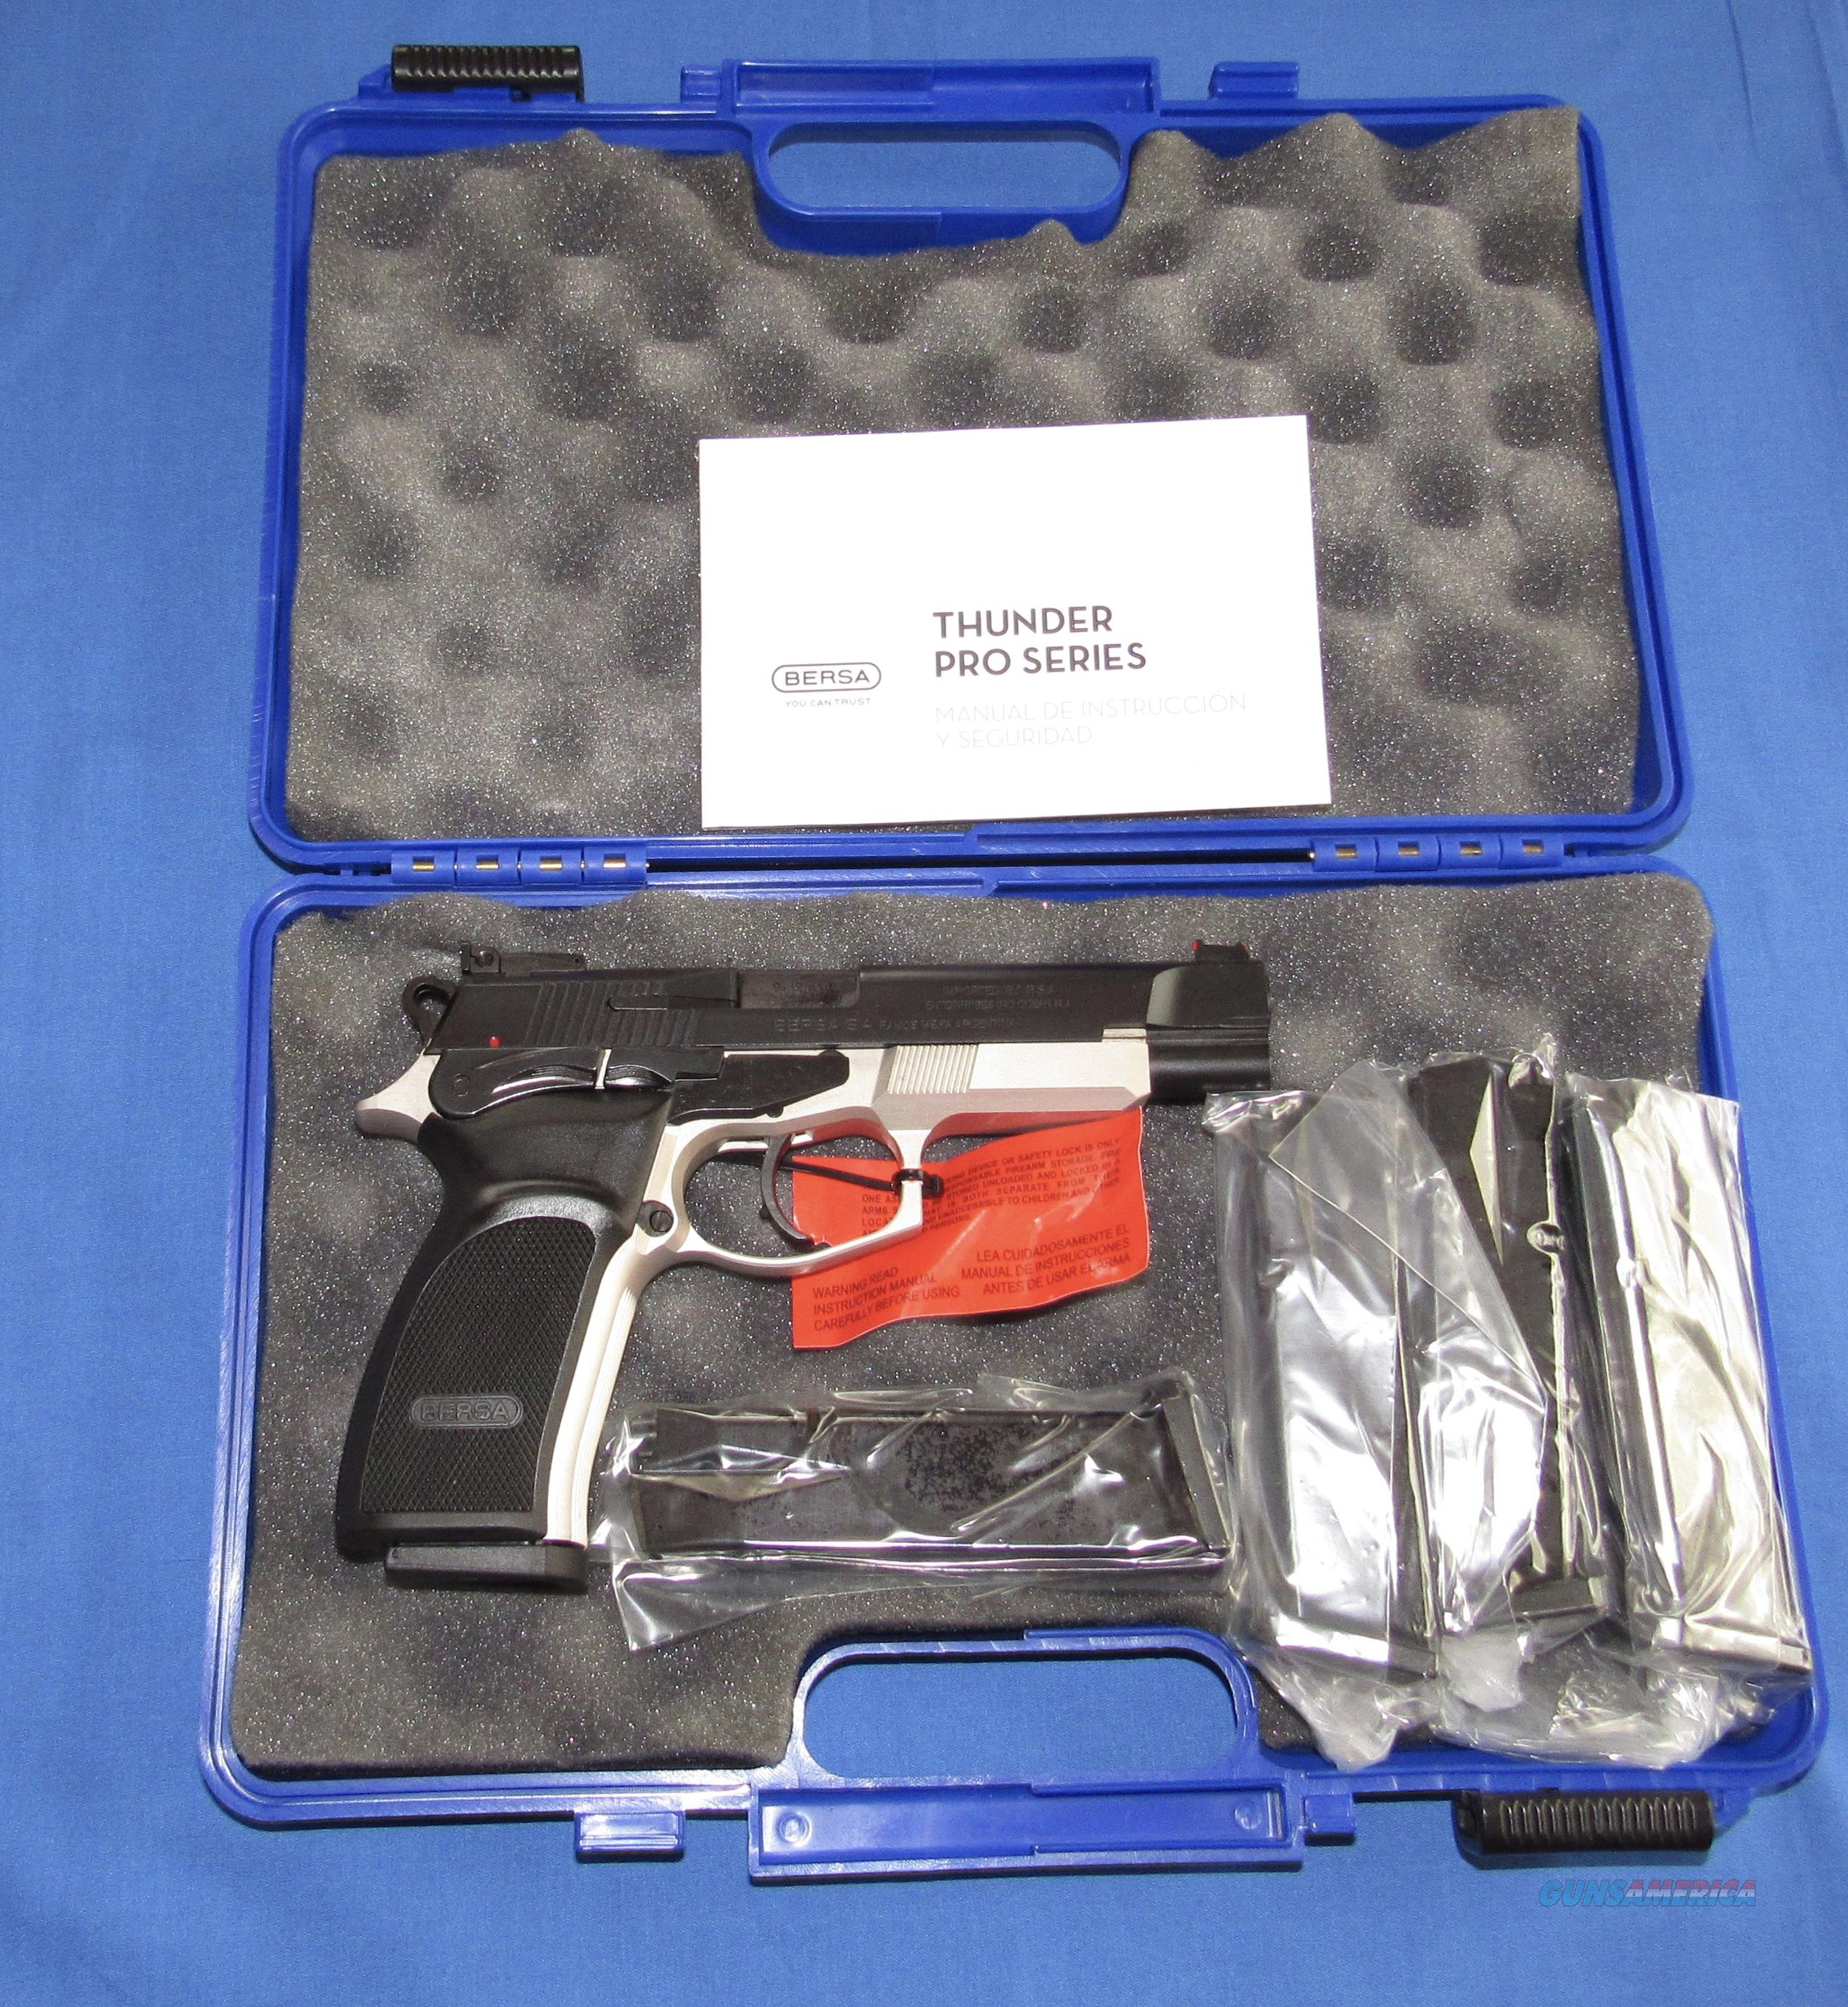 CLEARANCE PRICED!  BERSA THUNDER PRO 9 XT DUOTONE 9MM PISTOL W/5 MAGAZINES  Guns > Pistols > Bersa Pistols